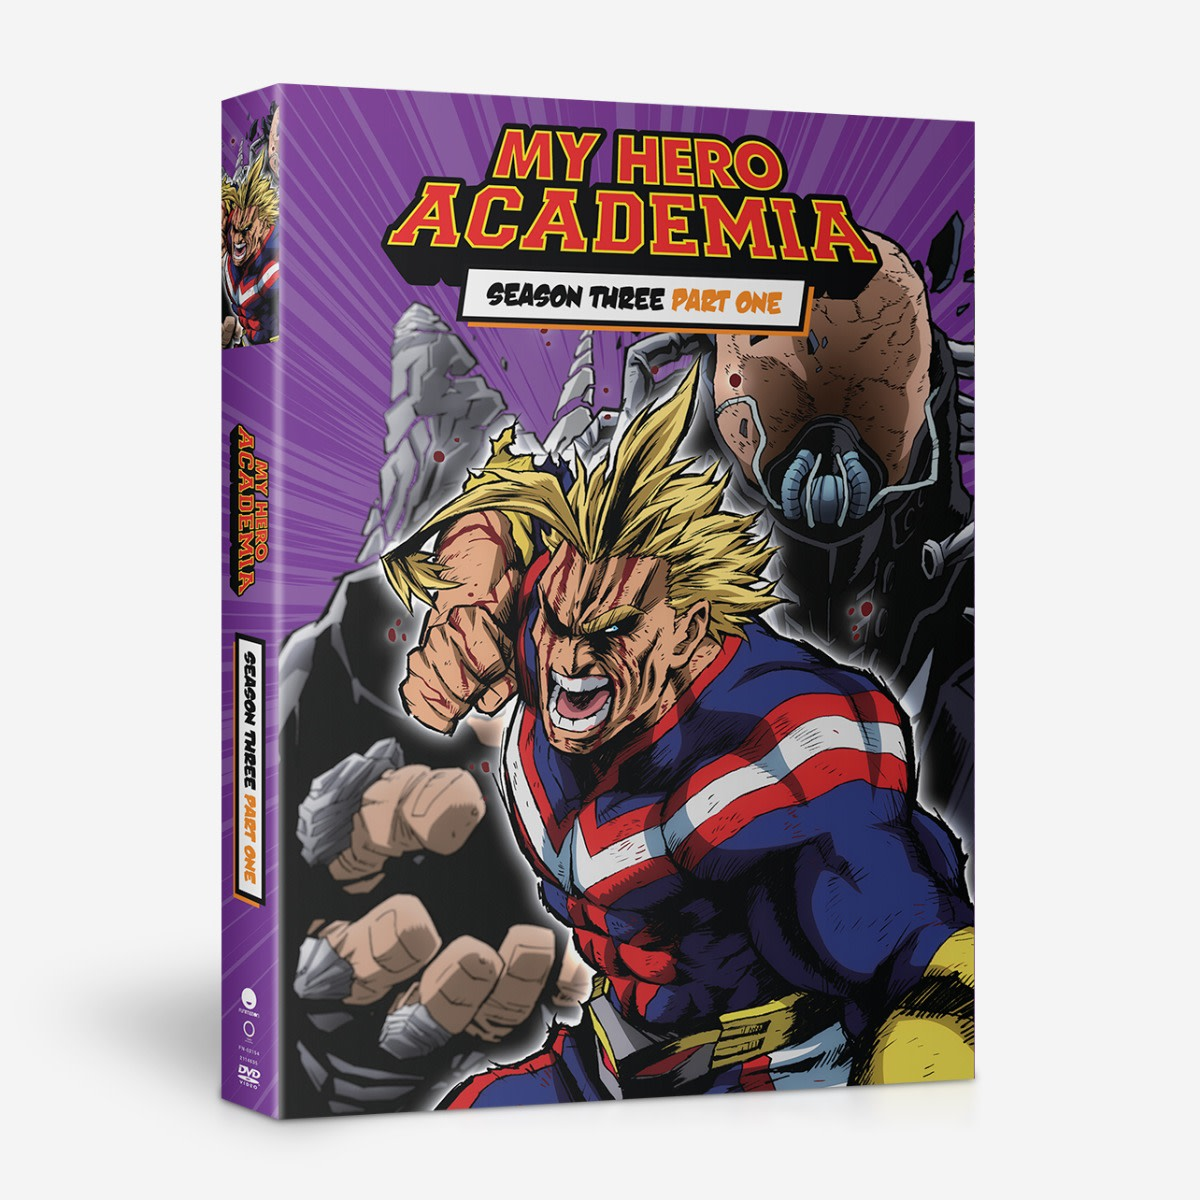 My Hero Academia: Season 3, Part 1 (Blu-ray / DVD Combo